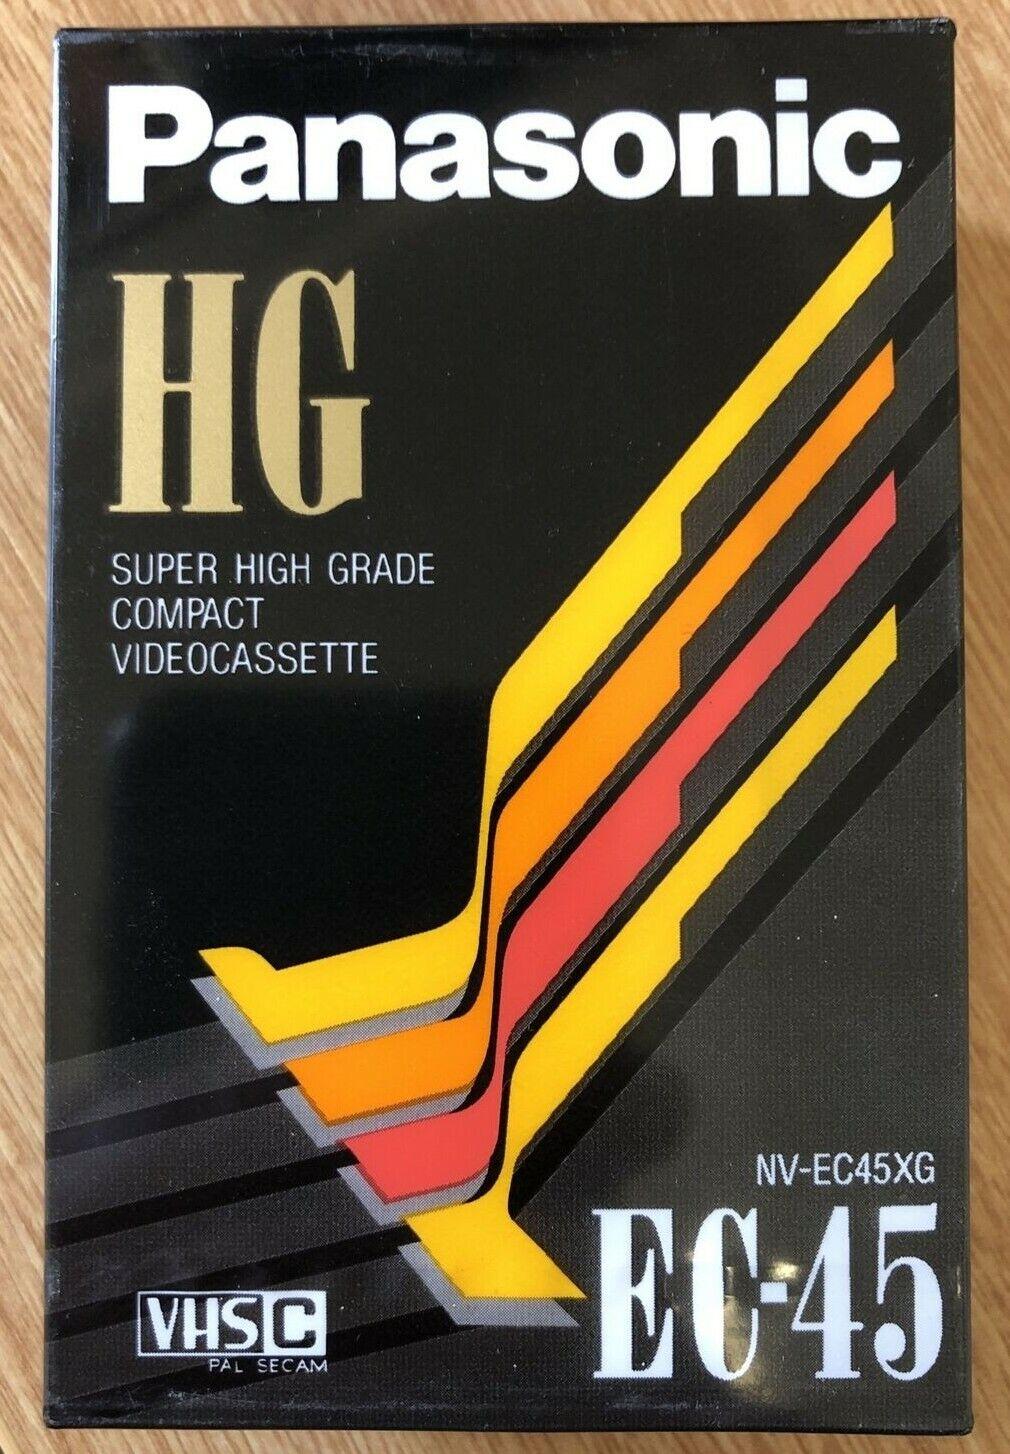 Panasonic HG EC-45 NV-EC45XG Camcorder tape for VHS-C - New Sealed